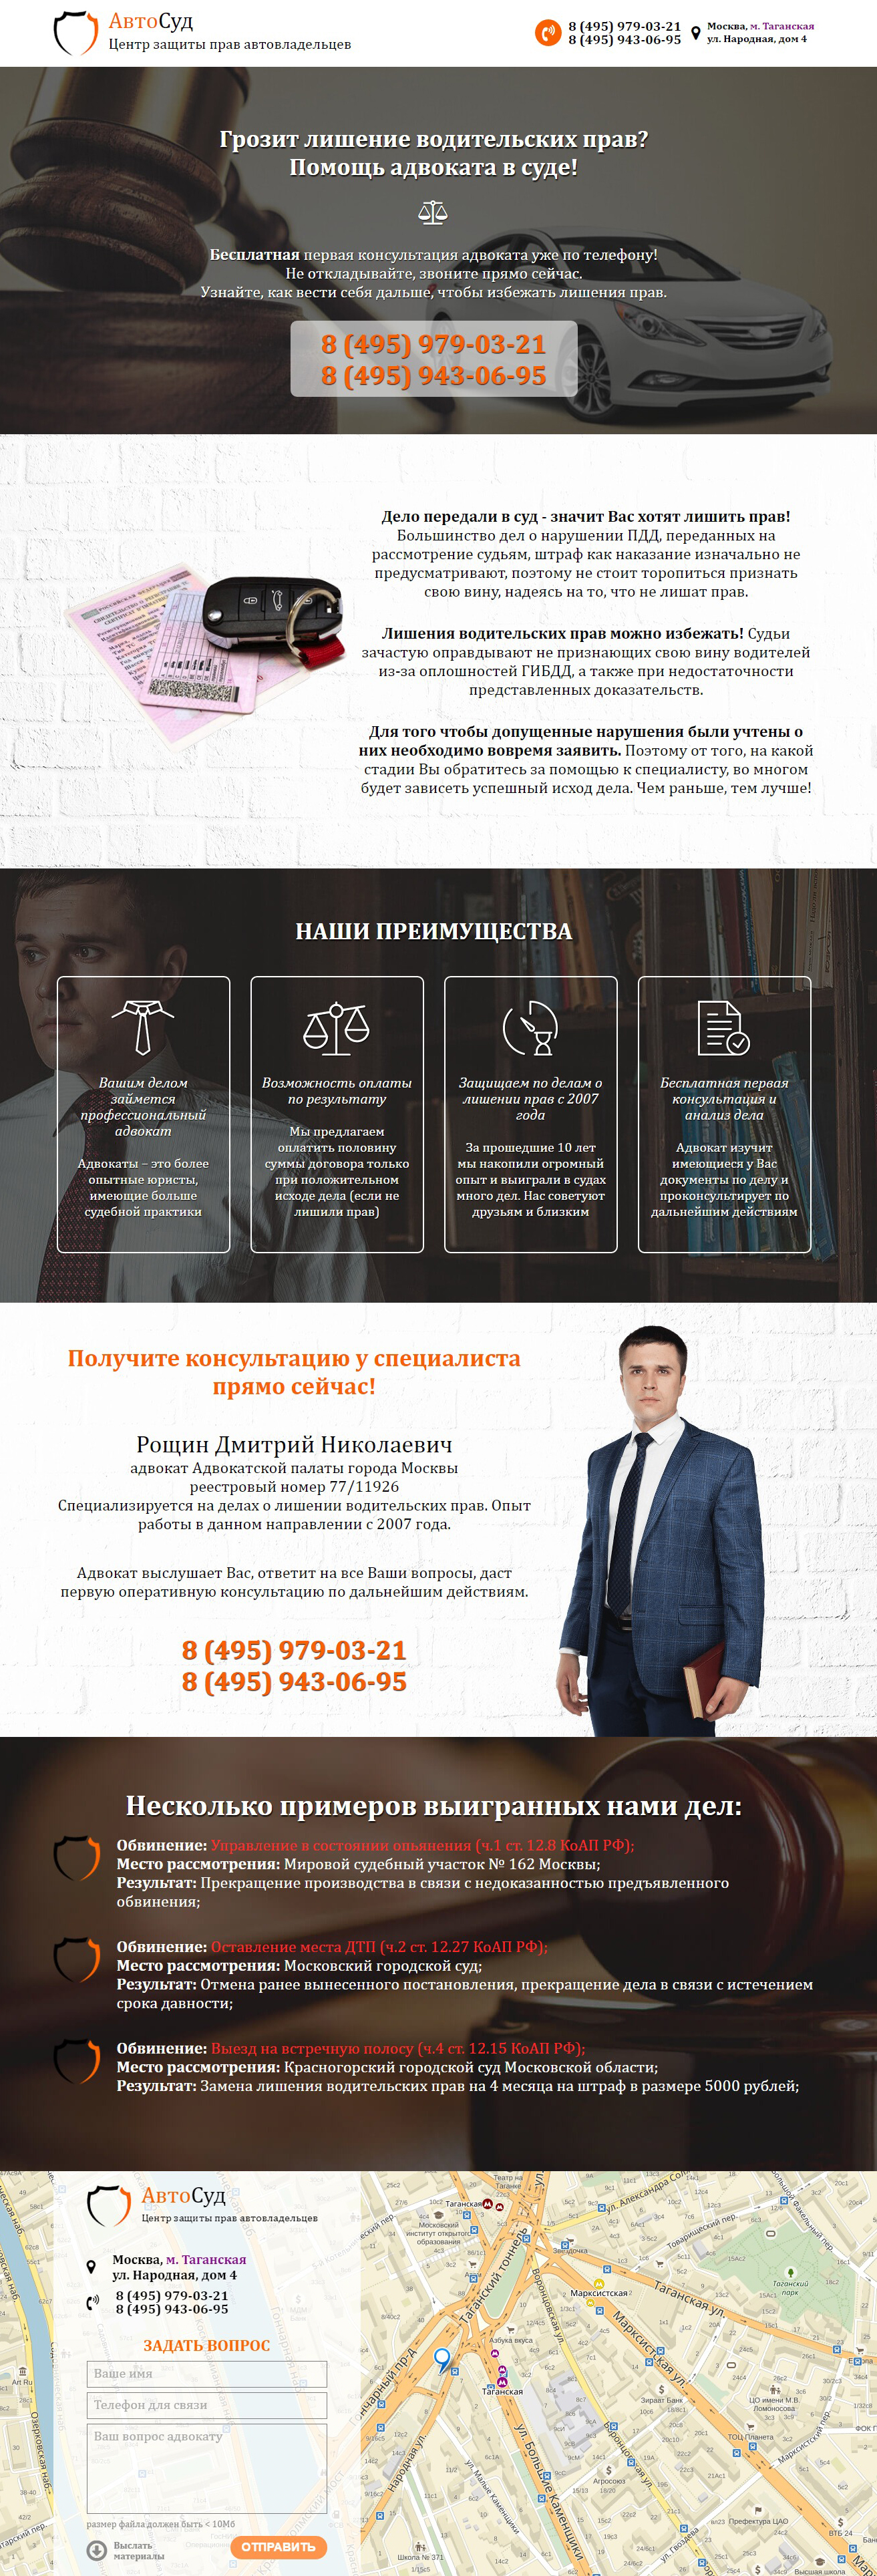 "HTML CSS PHP  Landingpage  ""Центр защиты прав автовладельцев"" (Москва)"